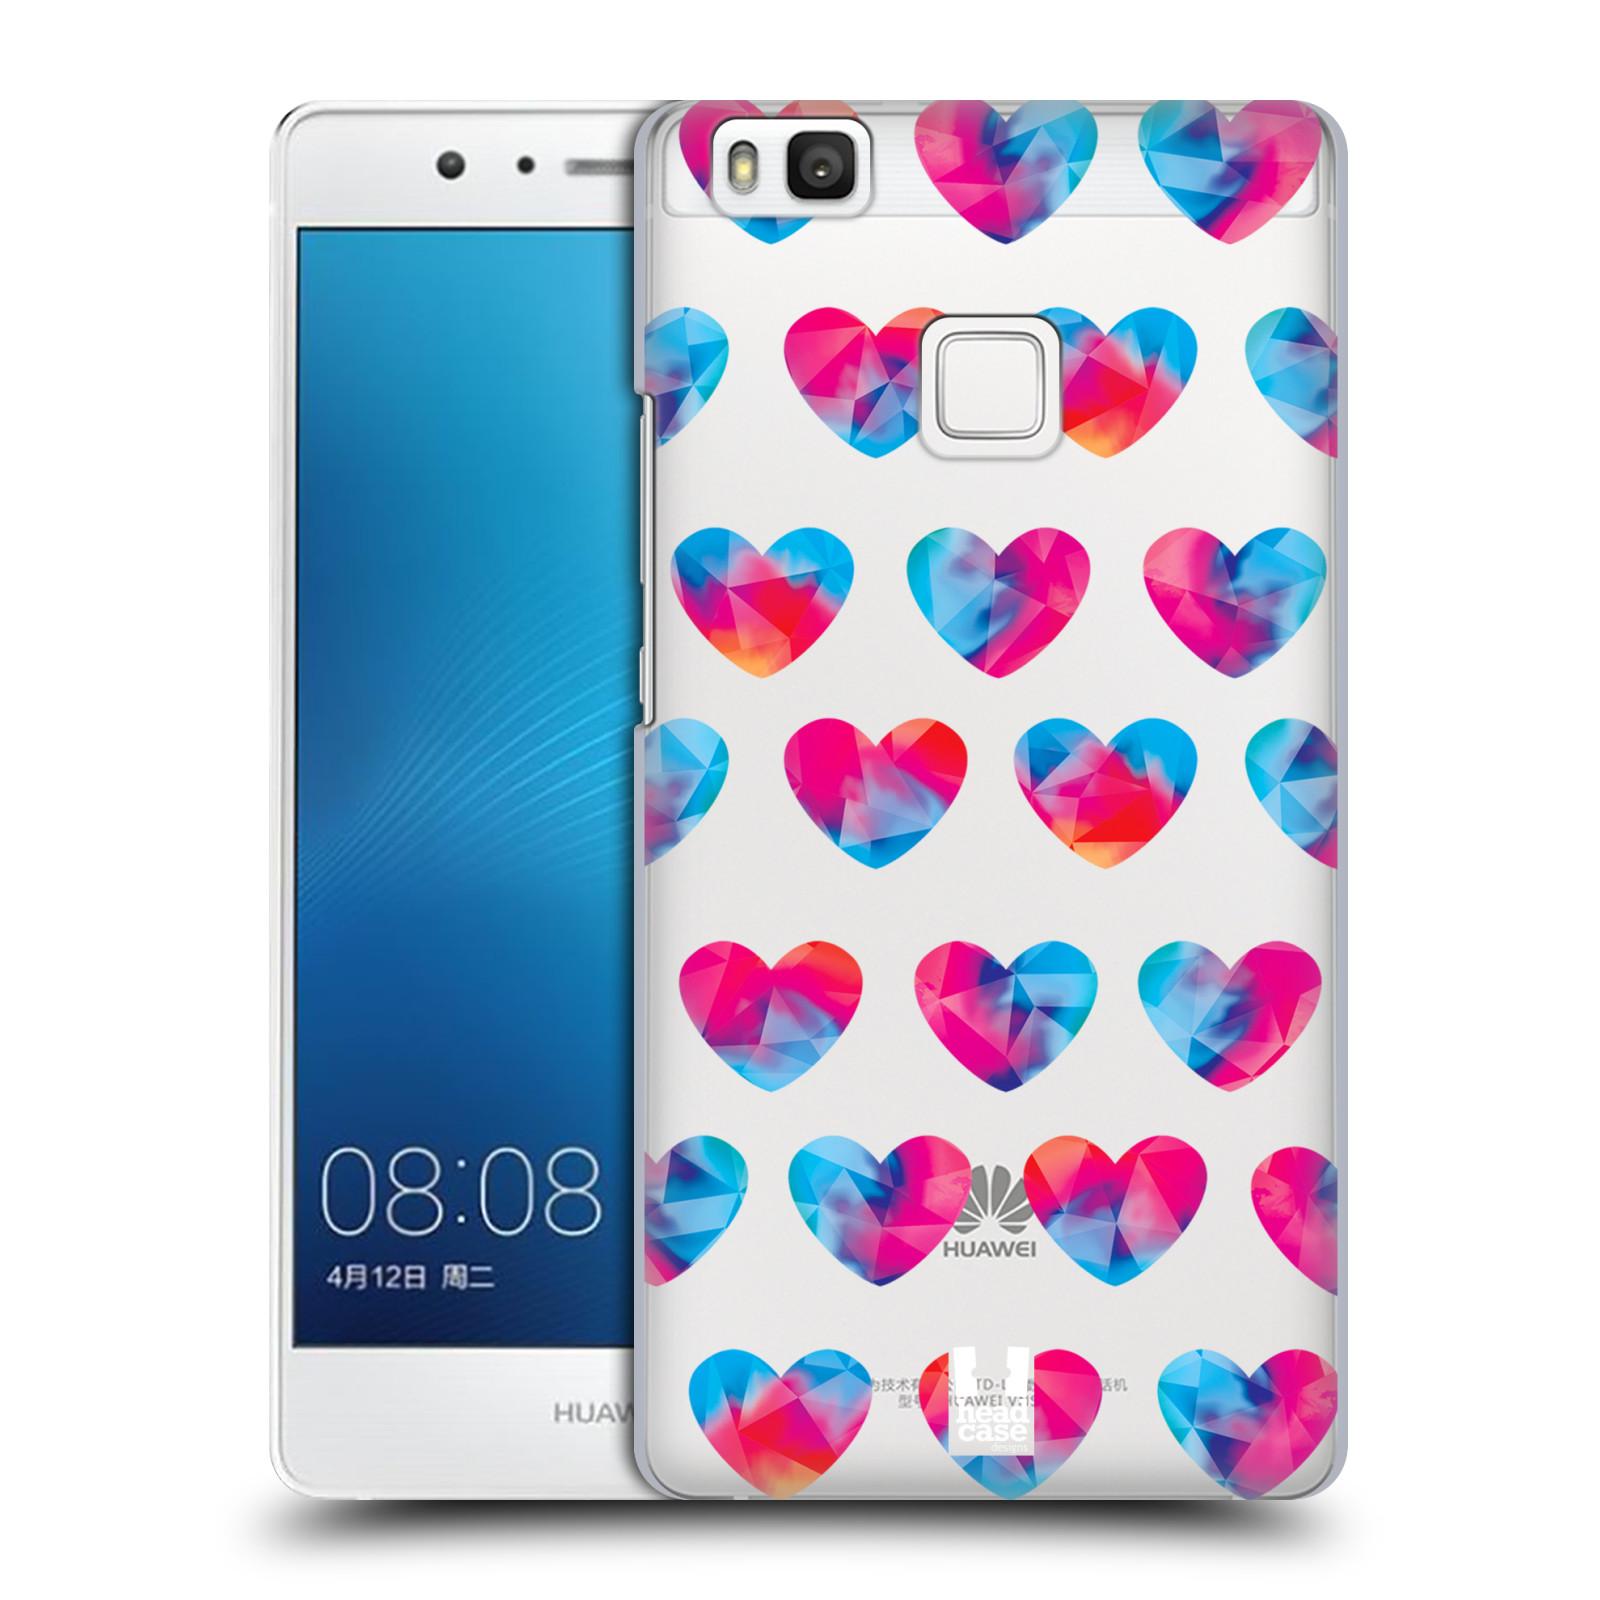 Plastové pouzdro na mobil Huawei P9 Lite - Head Case - Srdíčka hrající barvami